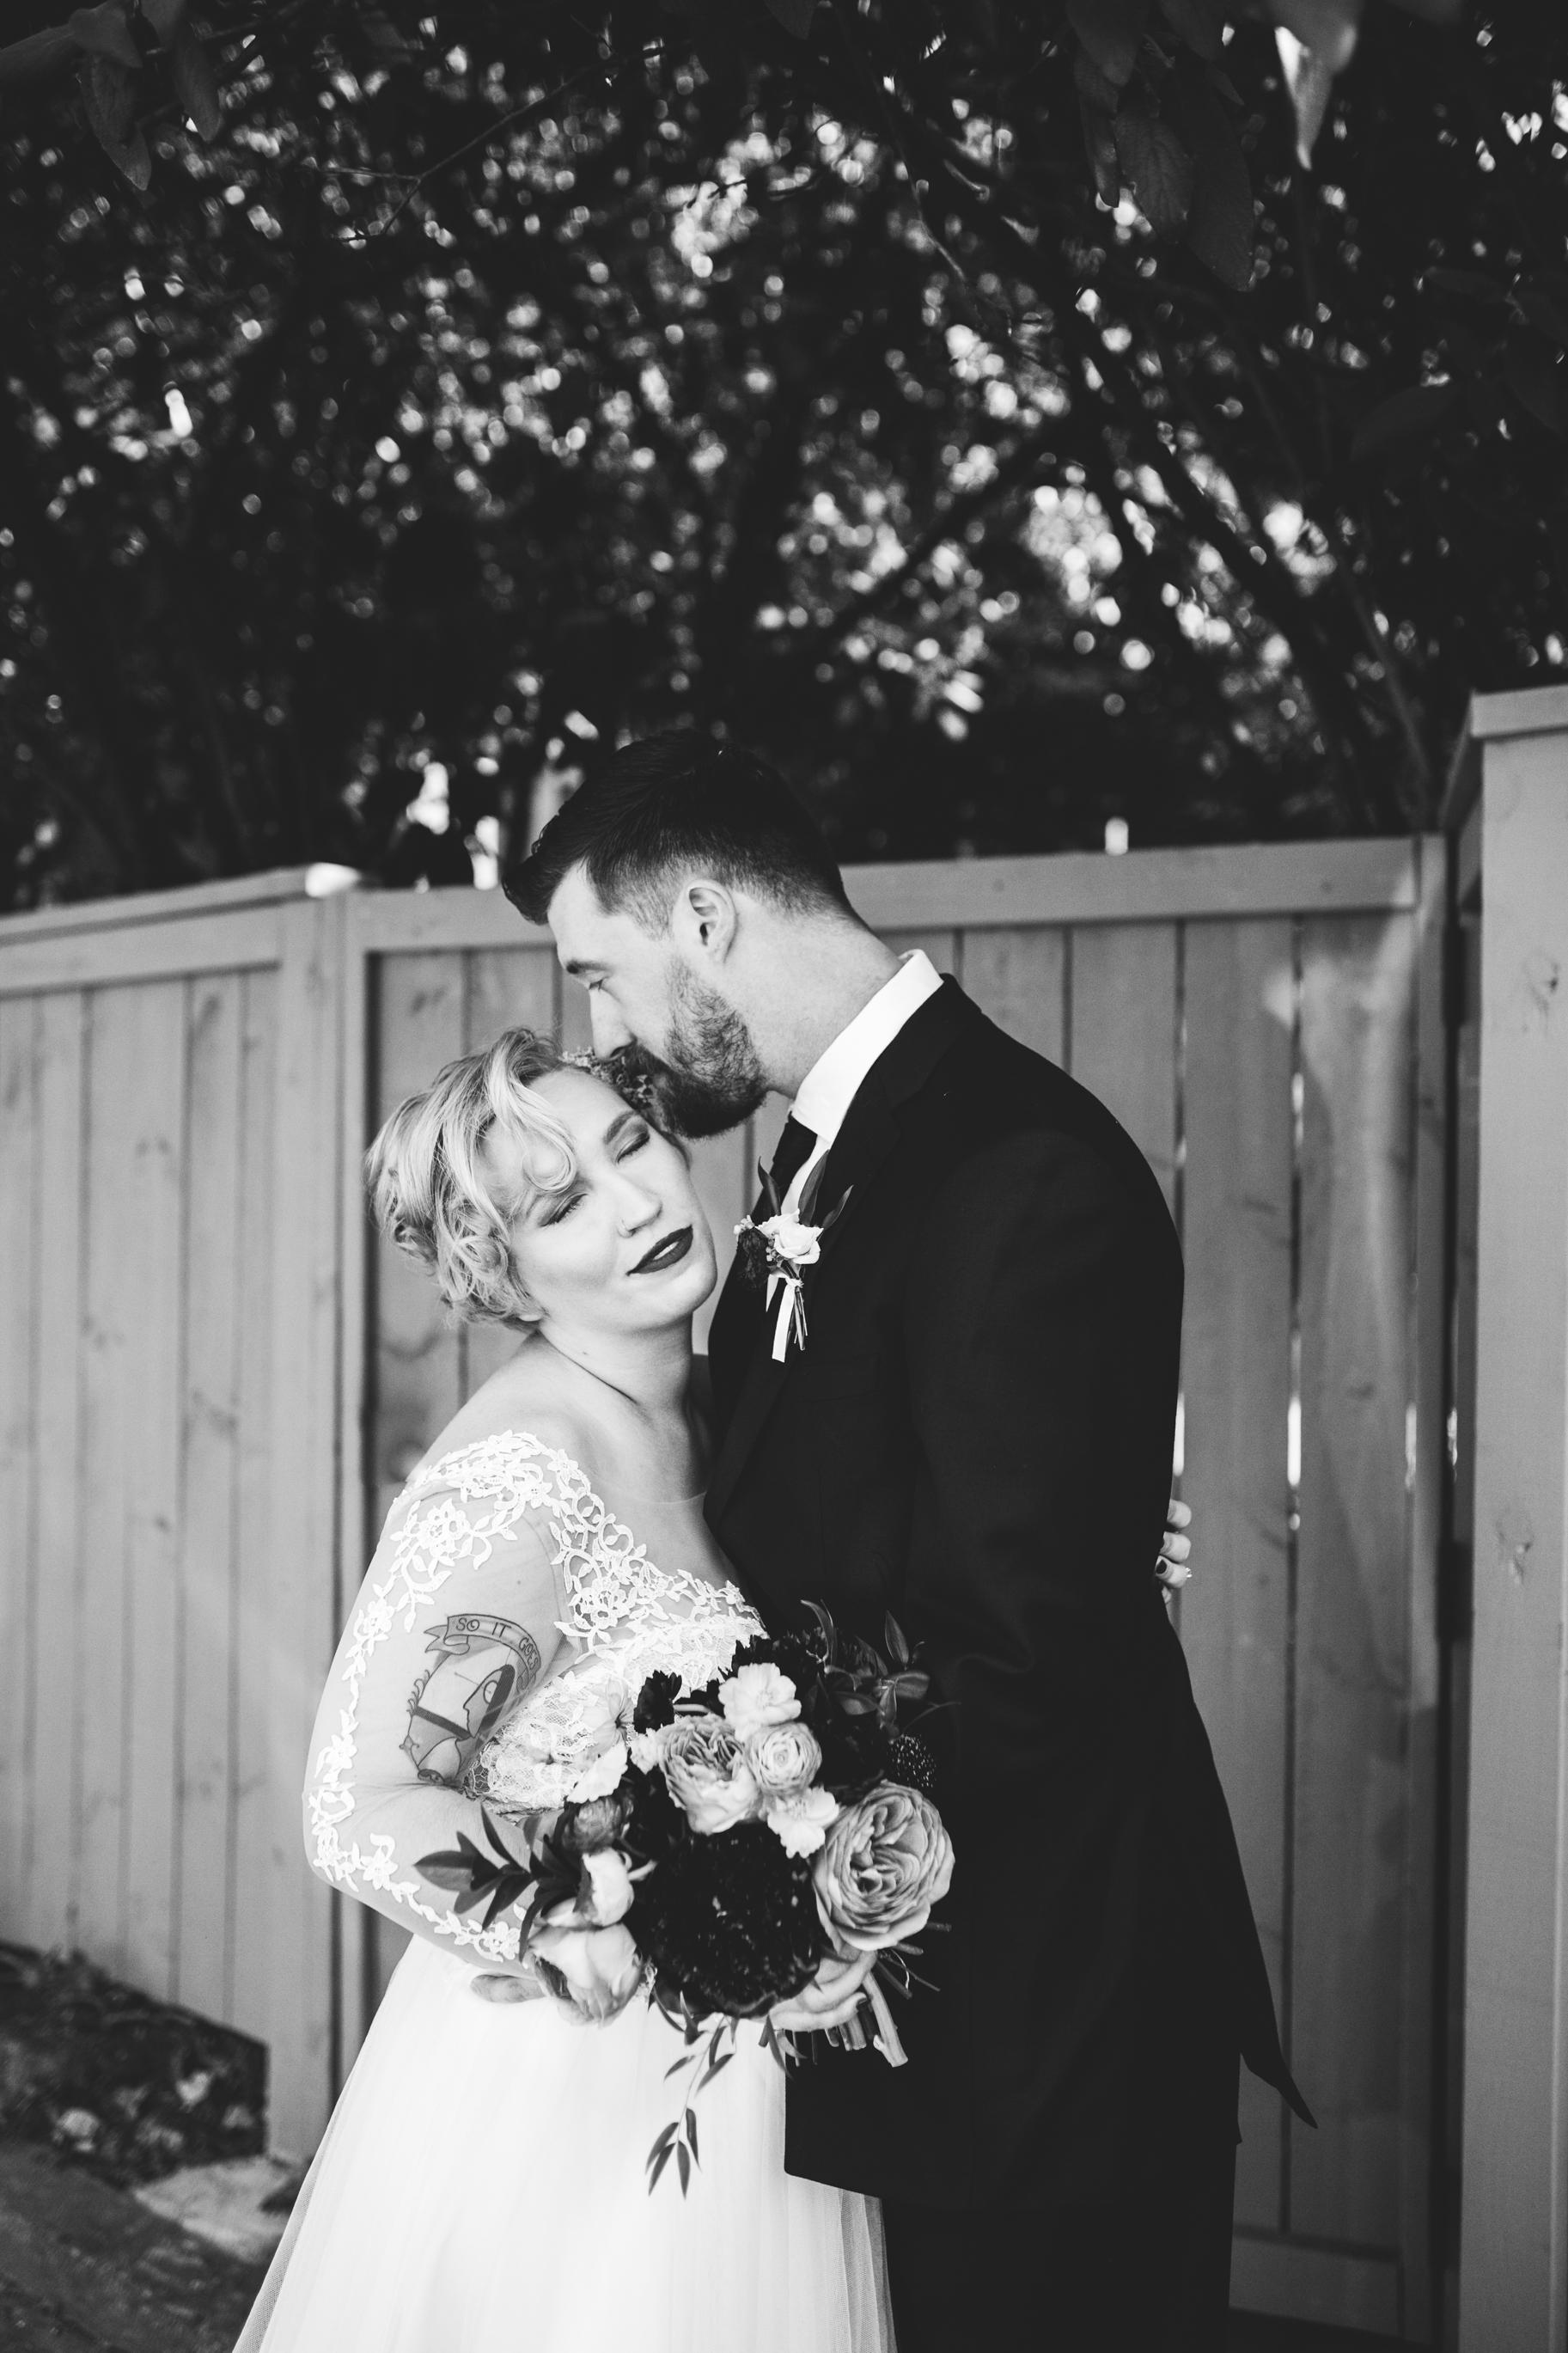 Kentucky Wedding Louisville Wedding Photographer 2018 Crystal Ludwick Photo Louisville Wedding Photographer Kentucky Wedding Photographer (104 of 105).jpg